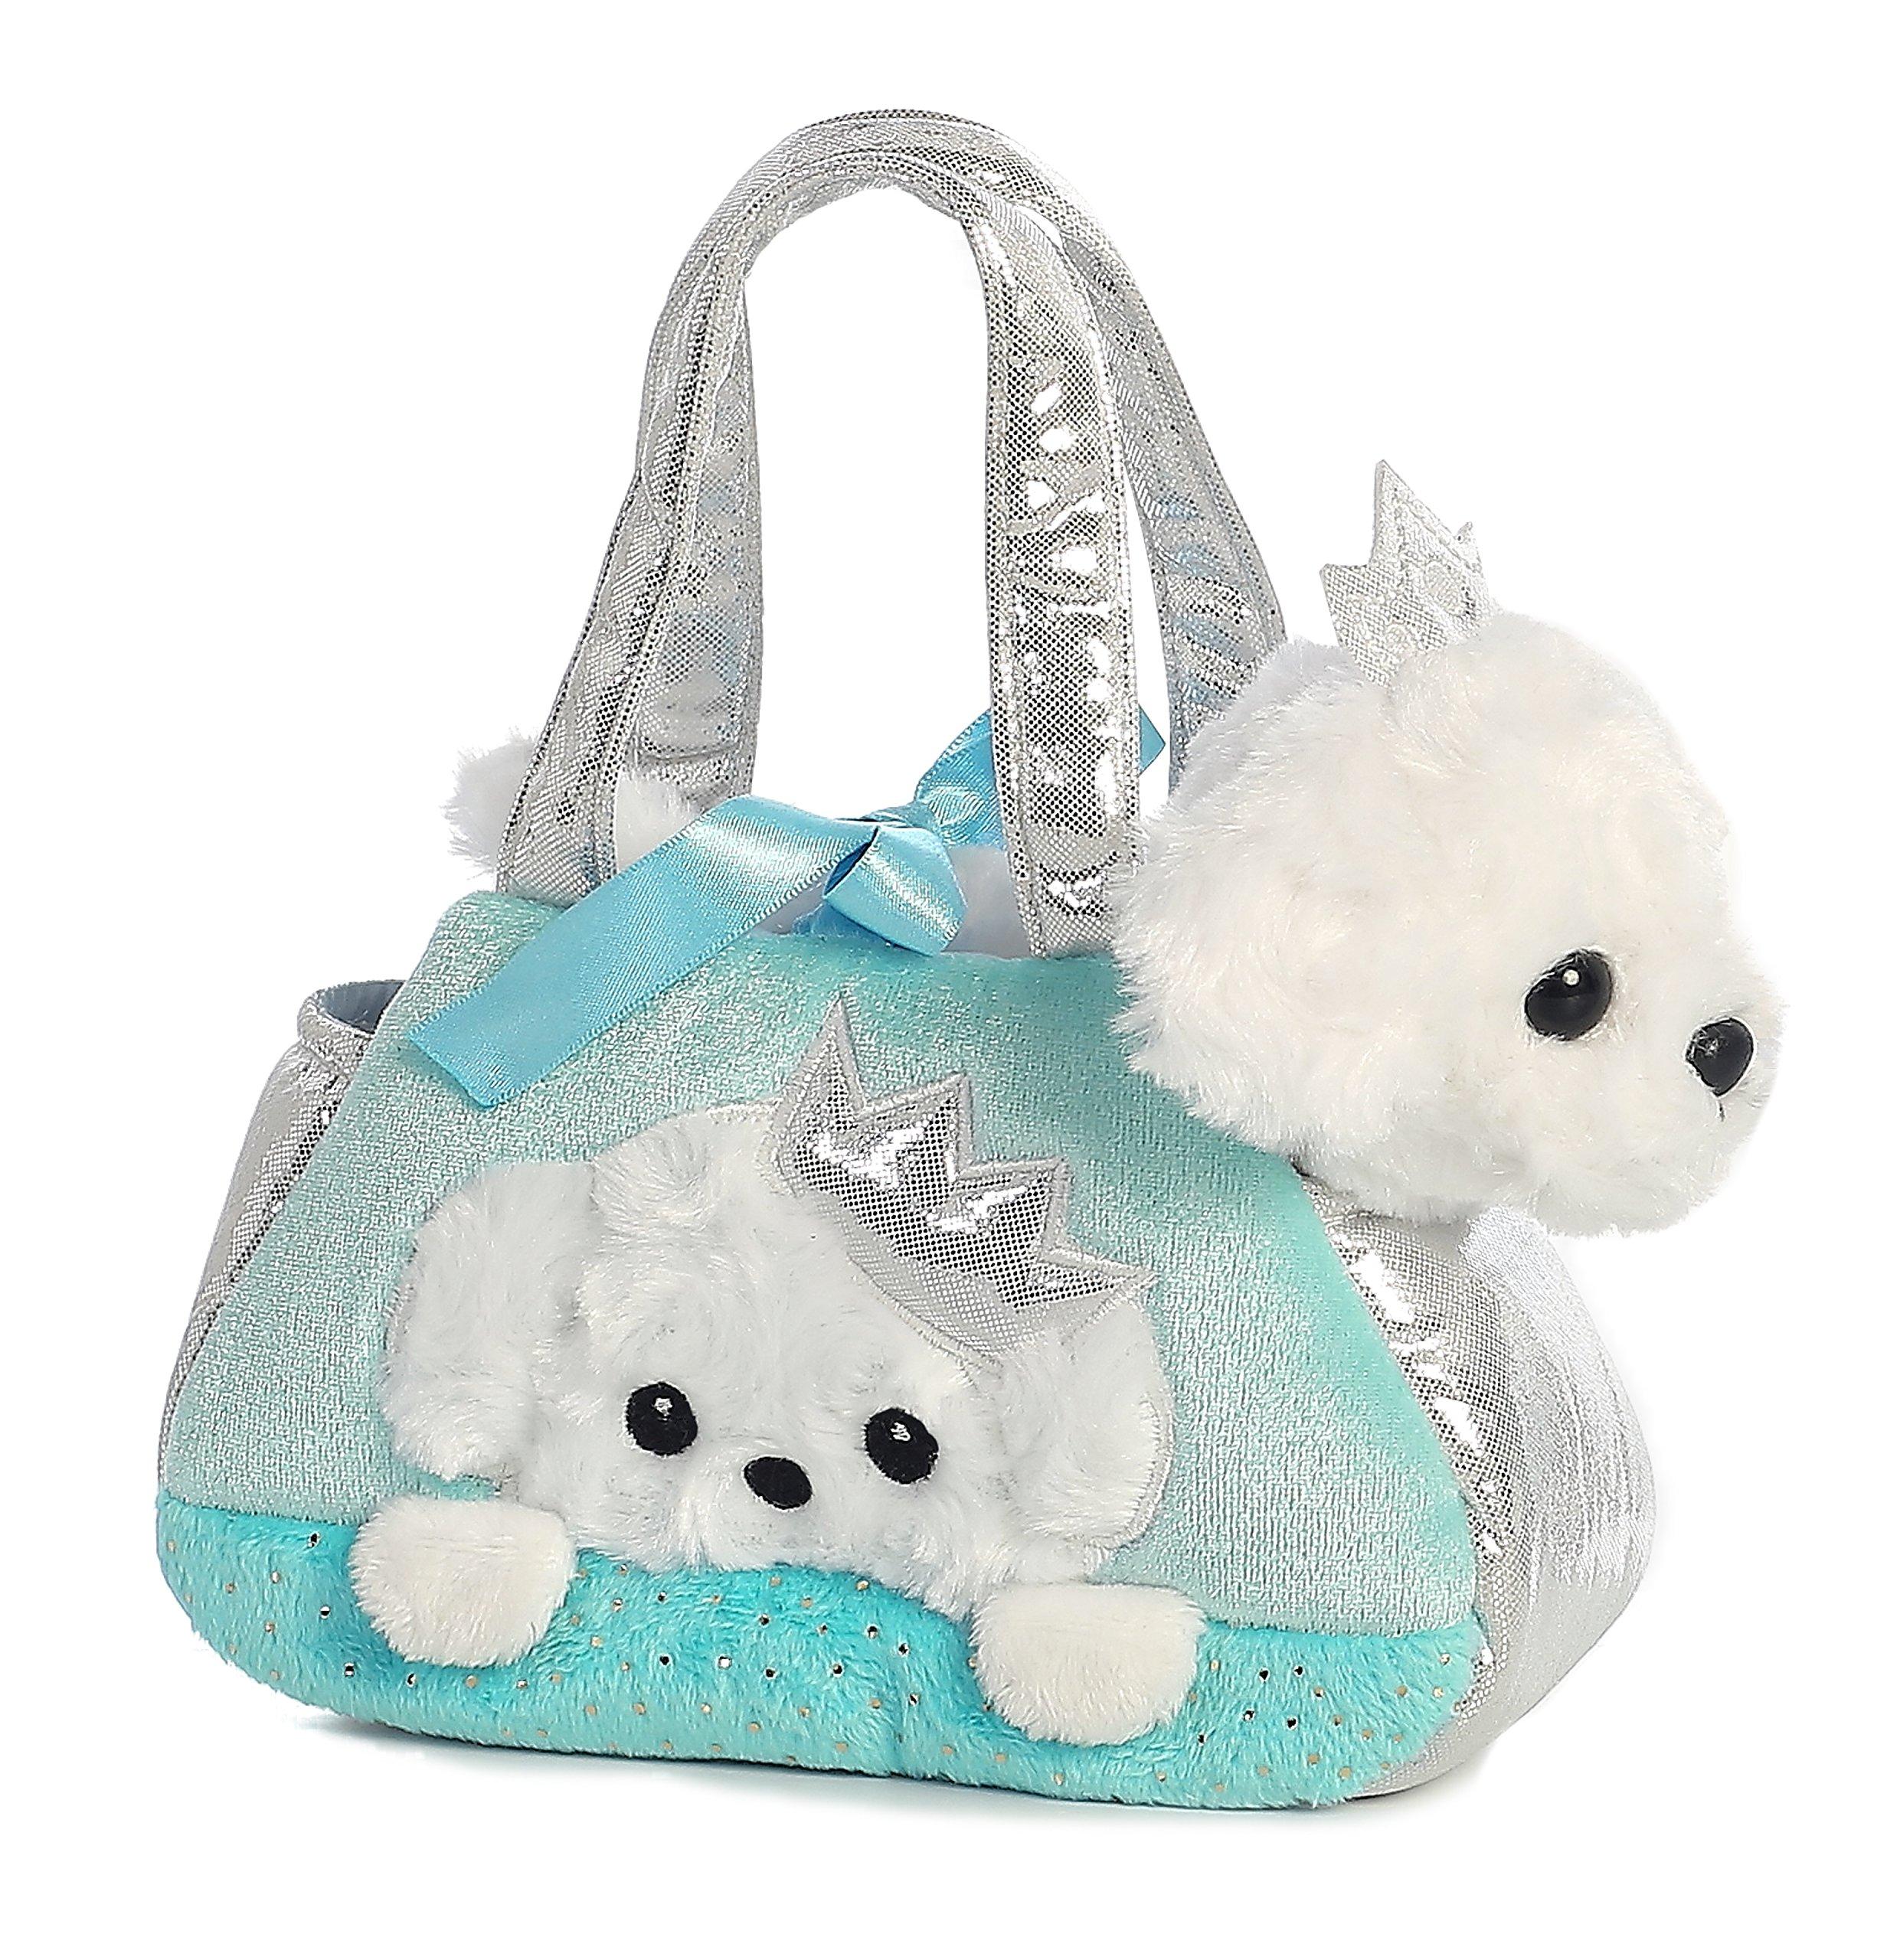 Aurora World Fancy Pals Pet Carrier, Peek-A-Boo Princess Puppy Teal, White, 7 inches